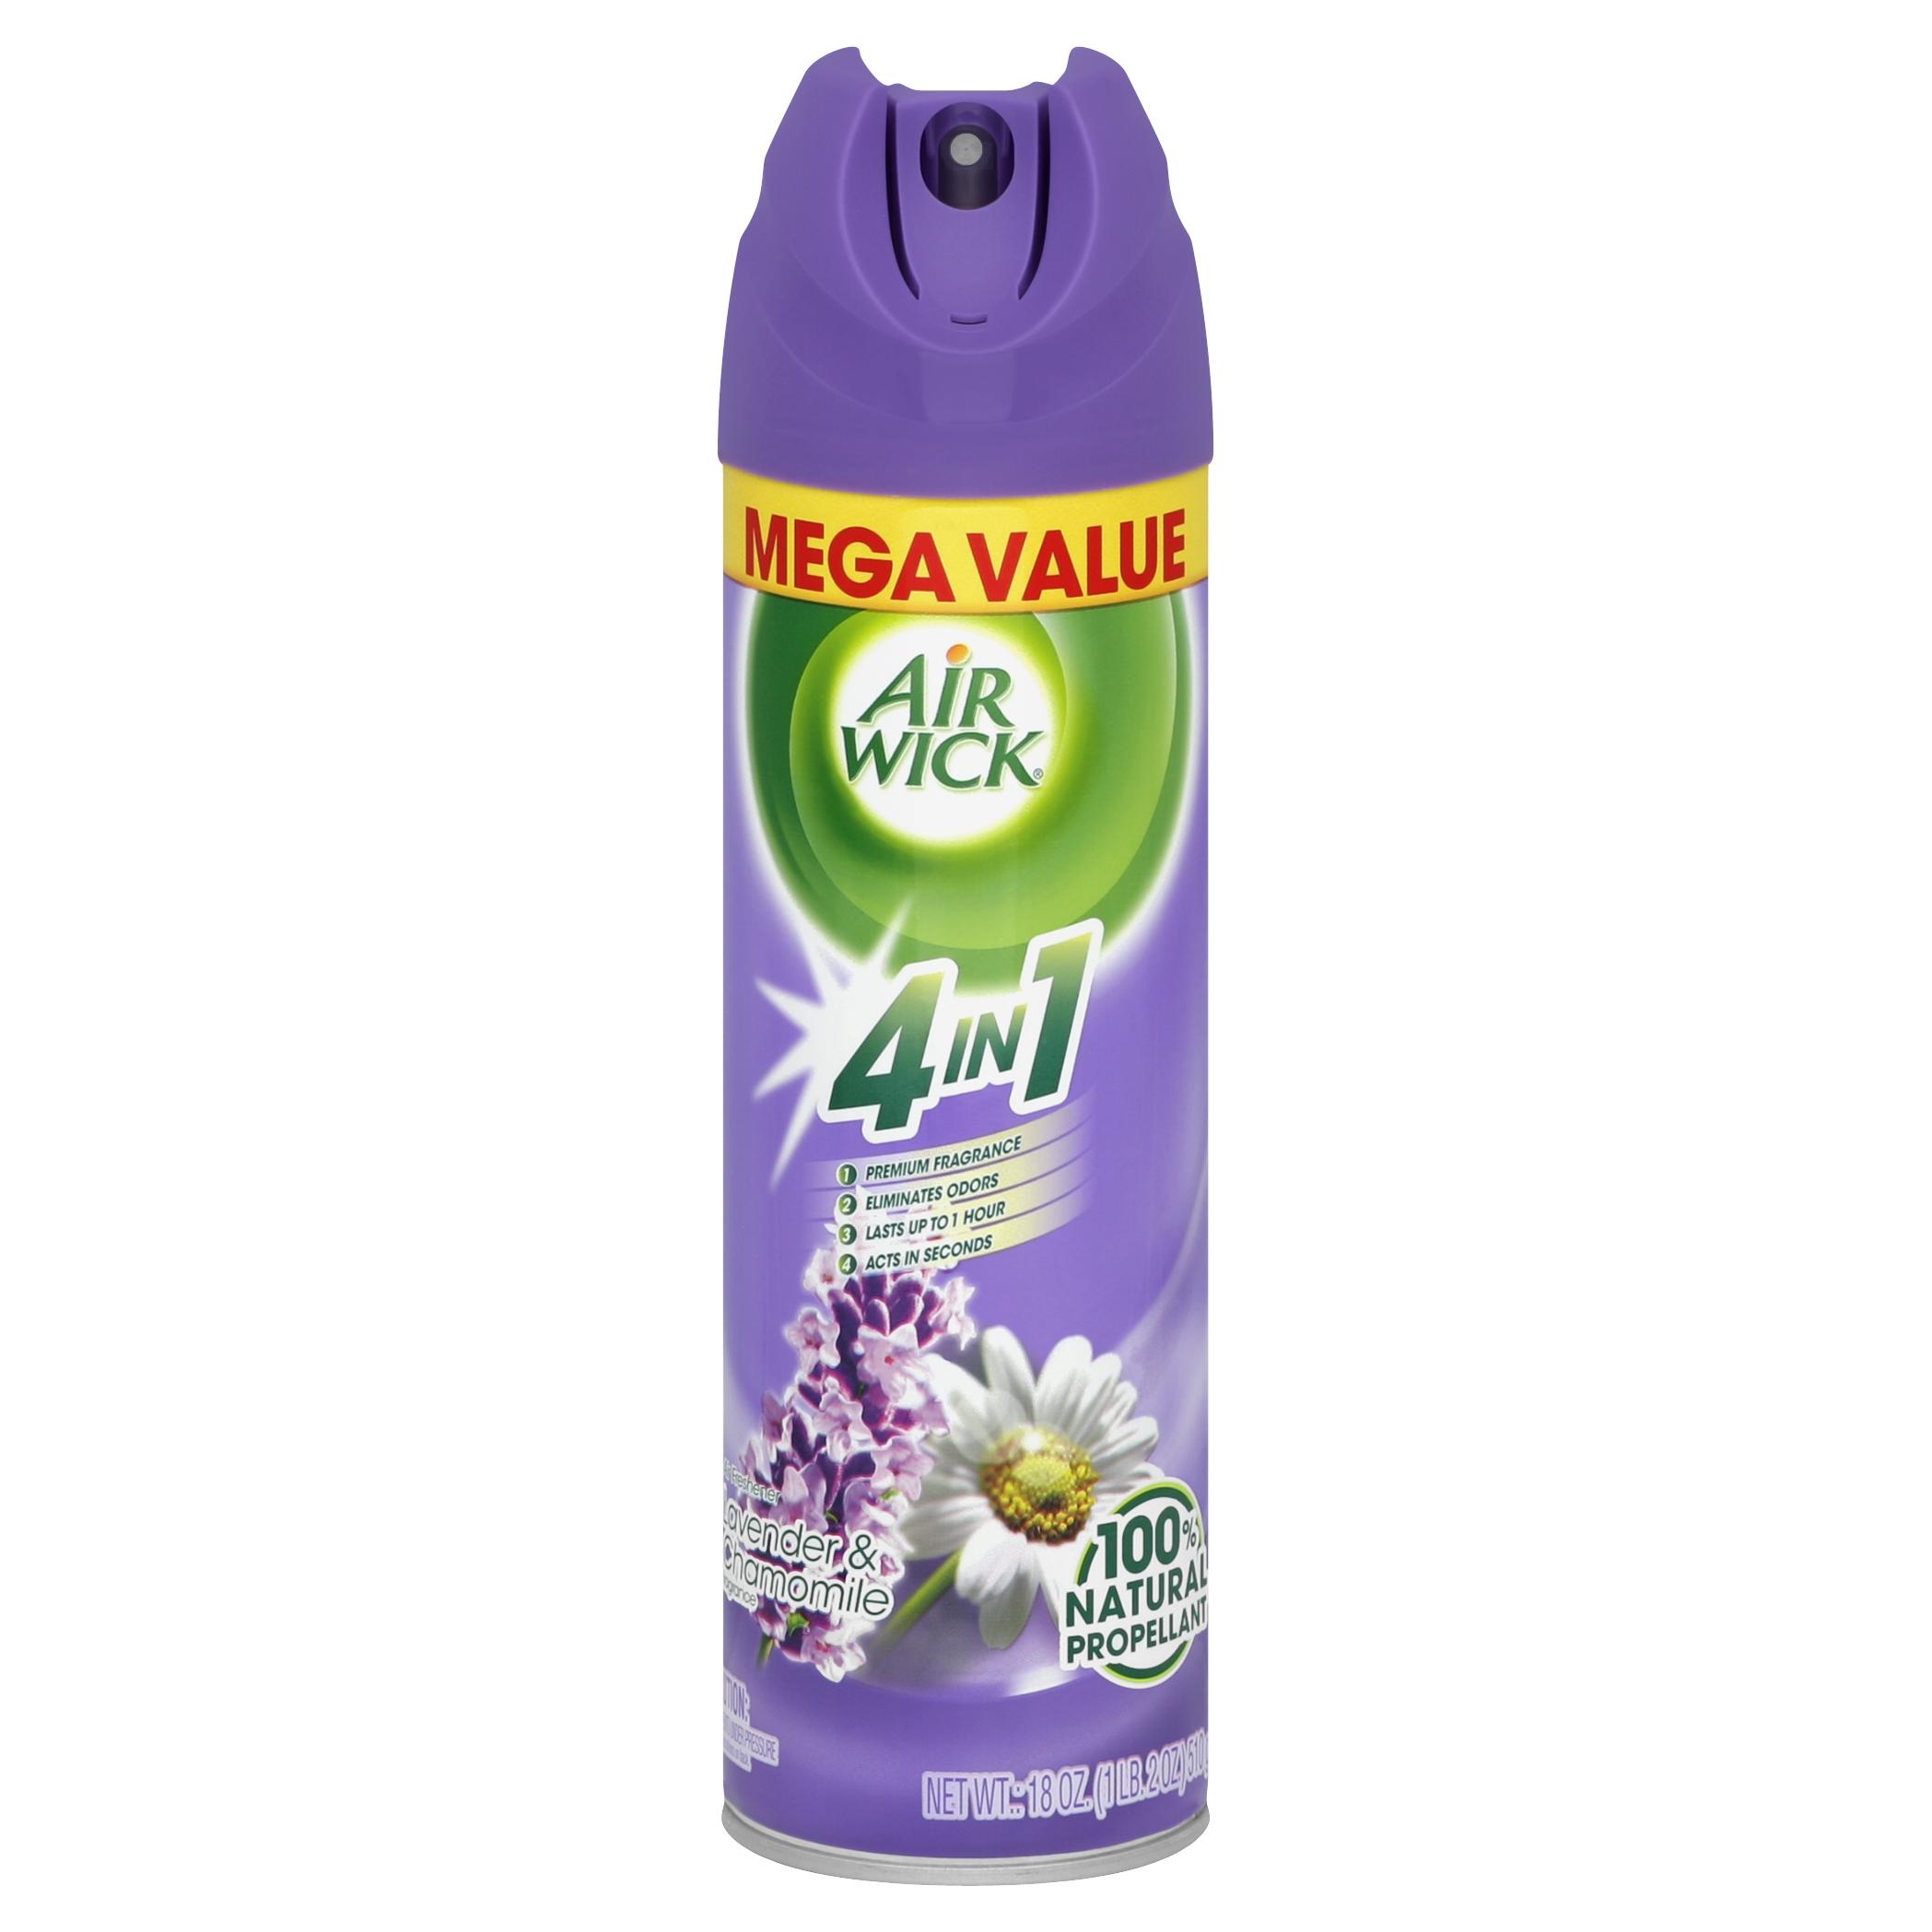 Air Wick Aerosol Spray Air Freshener, Lavender and Chamomile, 18 Ounce